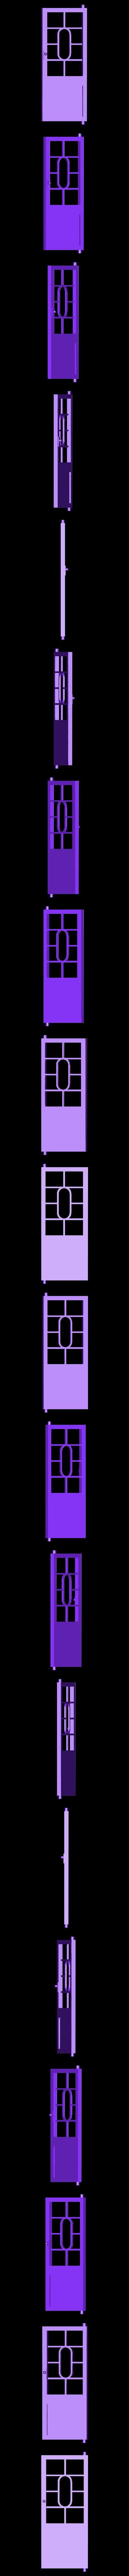 doorR1.stl Download free STL file Cereal box, Baroque house • Model to 3D print, Steedrick